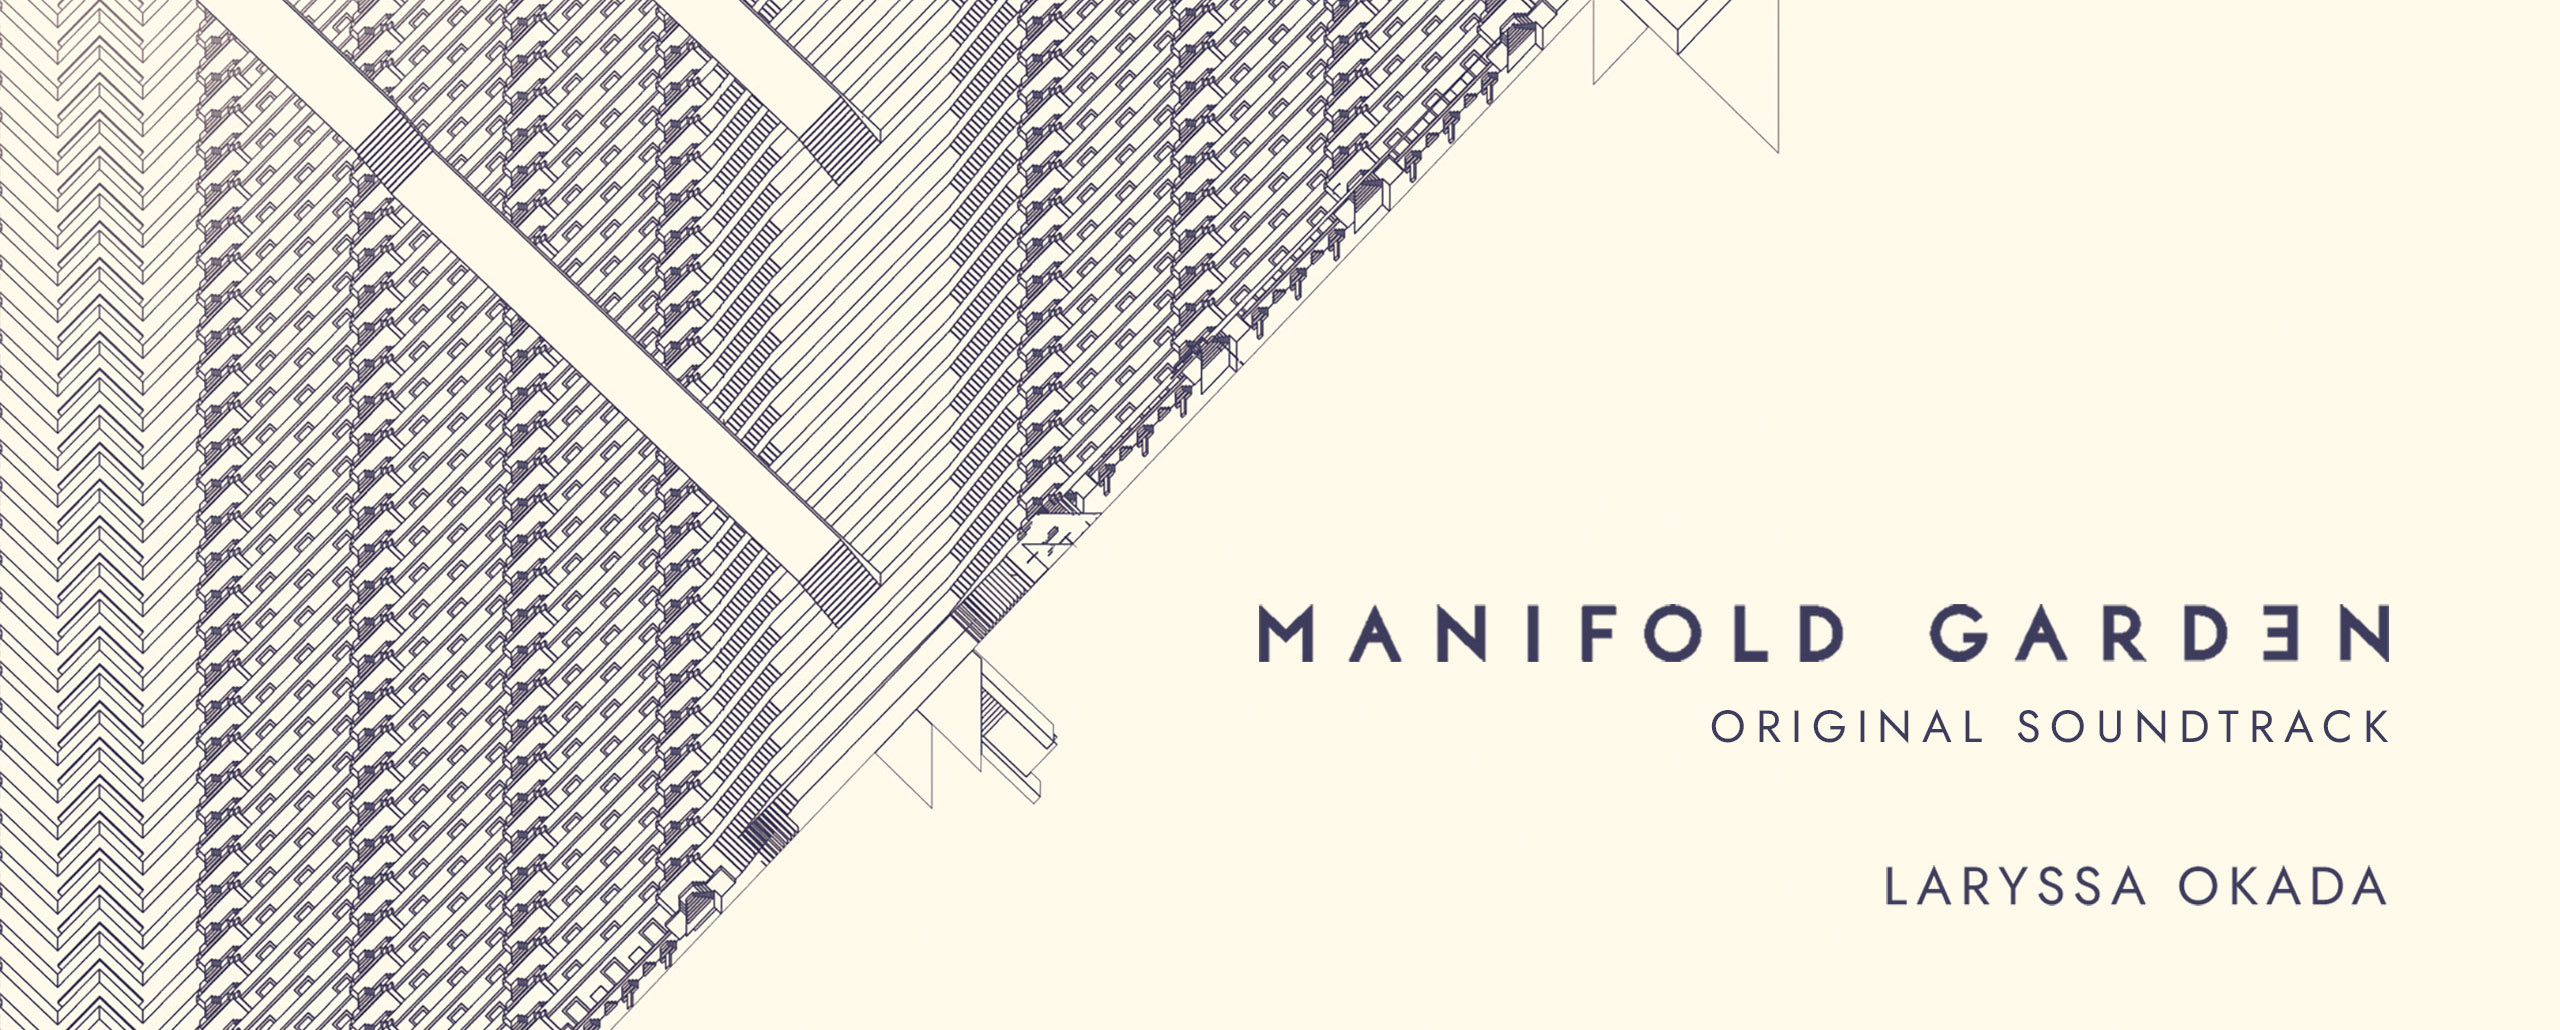 Manifold Garden Soundtrack